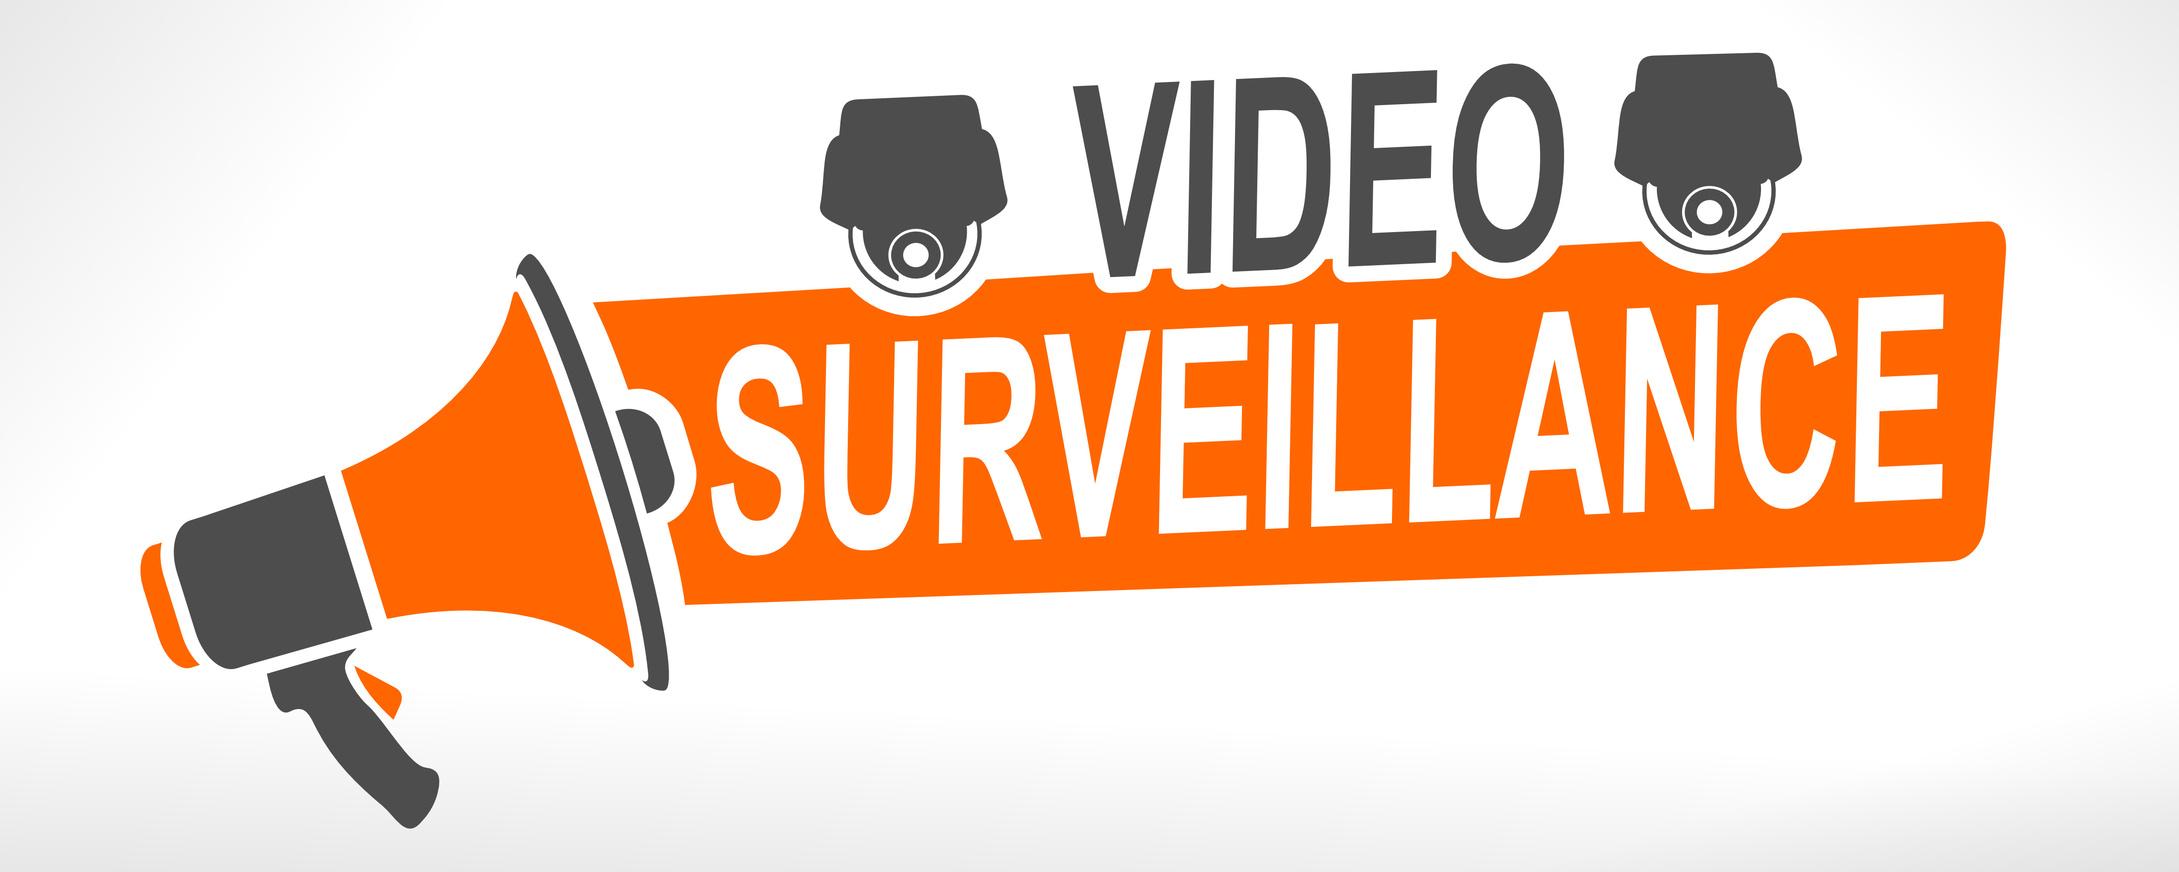 videosurveillance professionnelle